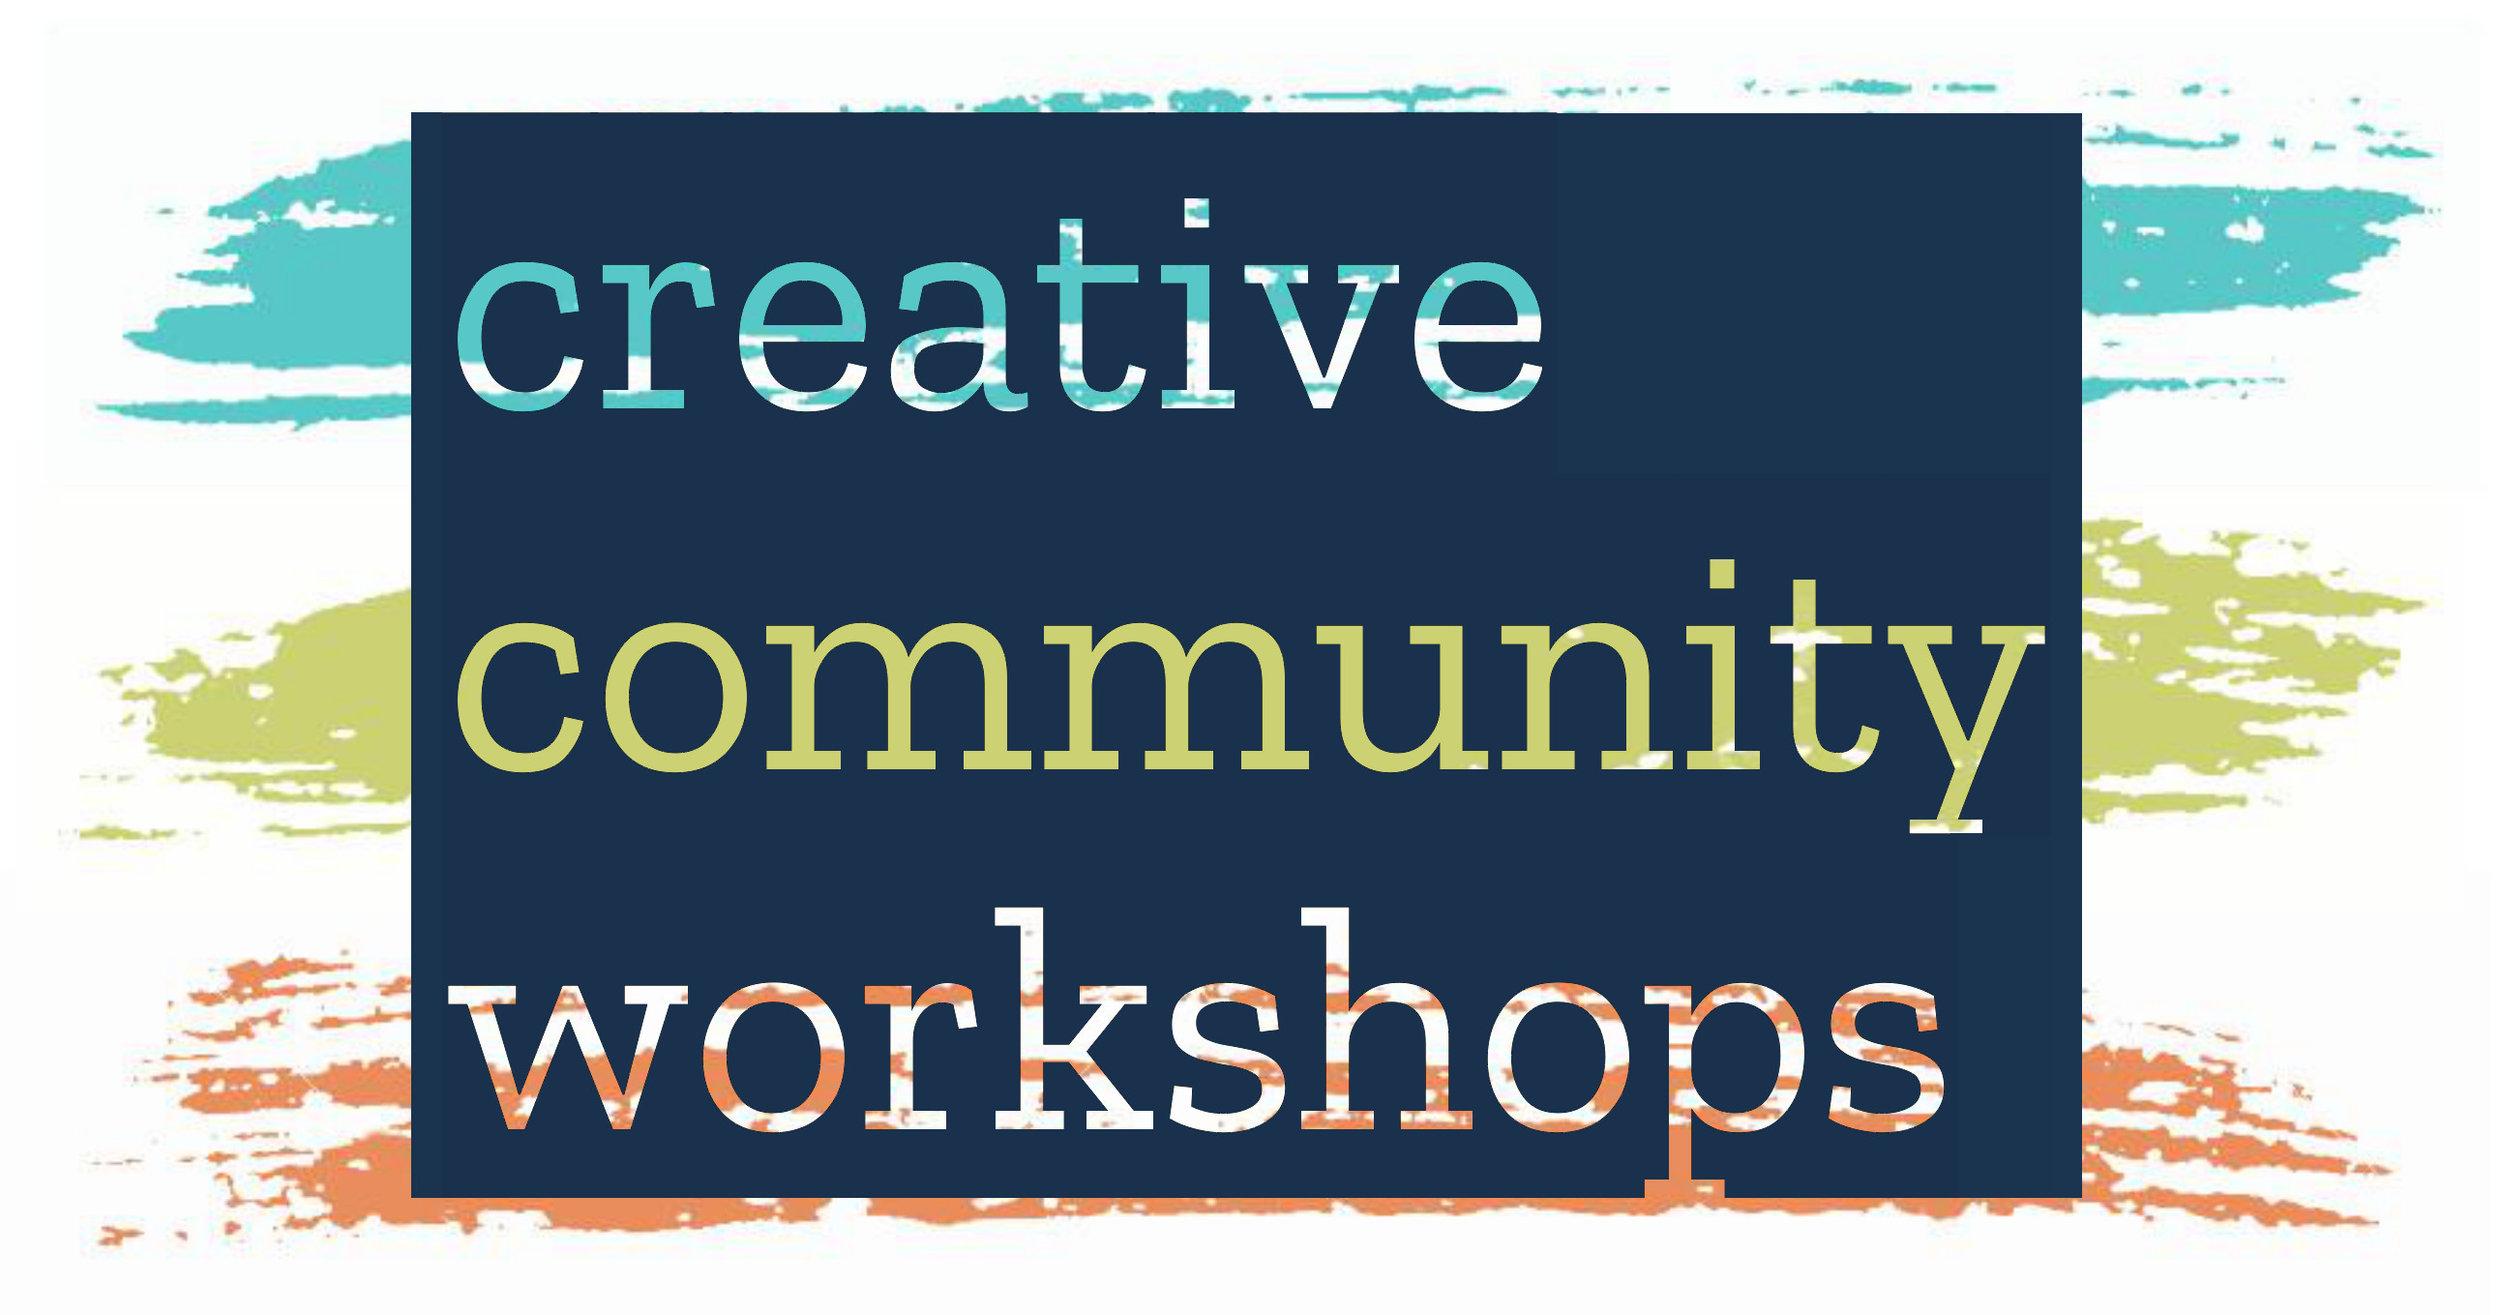 Creative Community Workshops (4).jpg